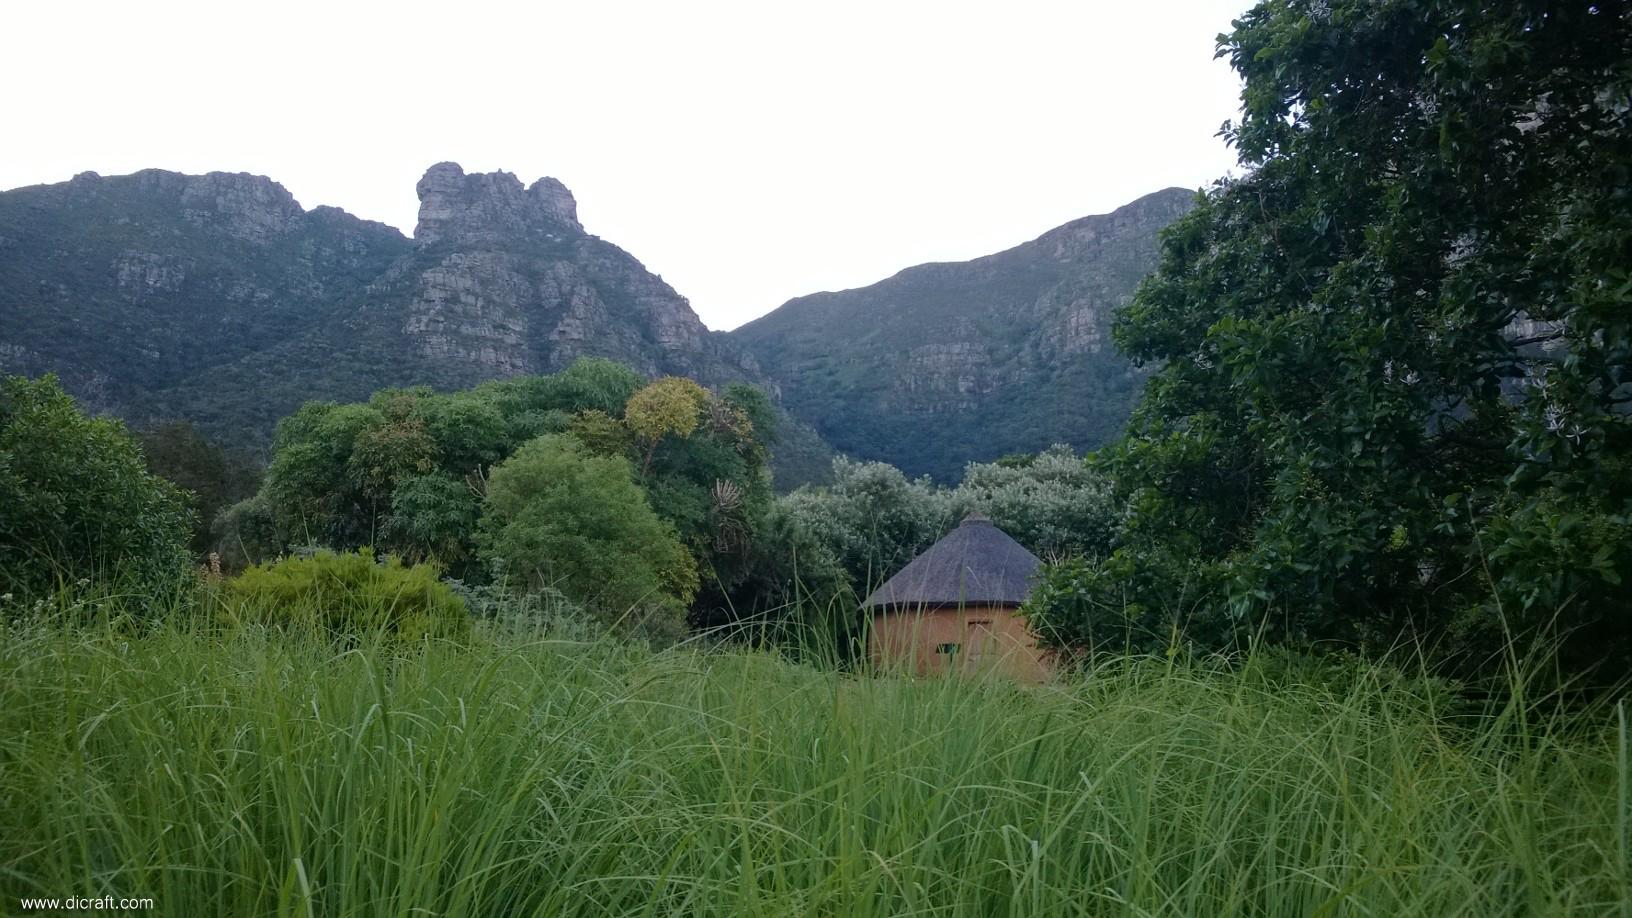 Castle Rock from Kirstenbosch Gardens